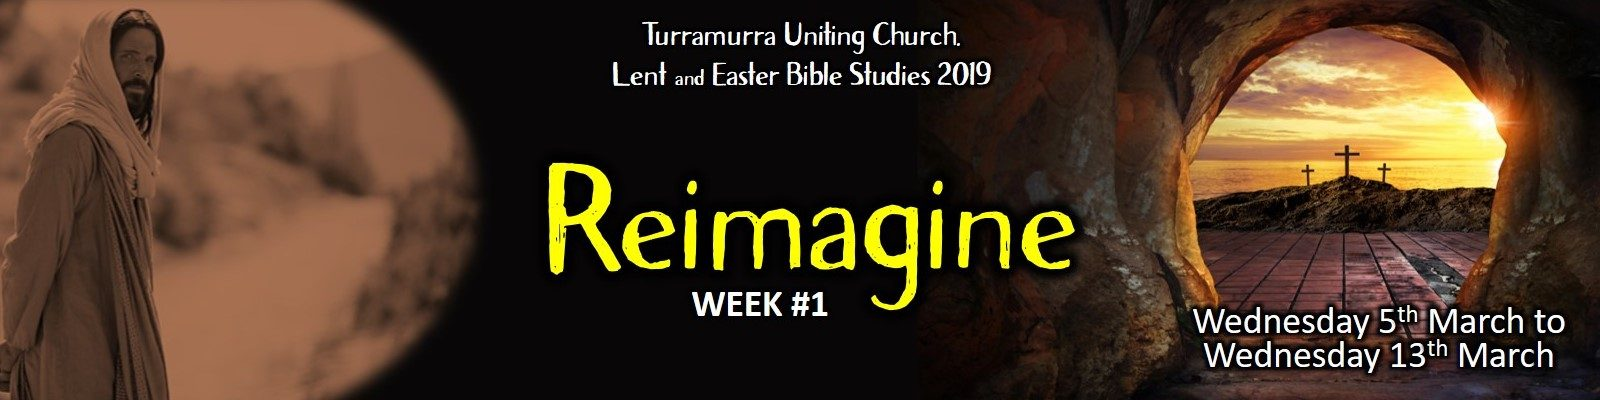 Lent Bible Study #1 - Reimagine